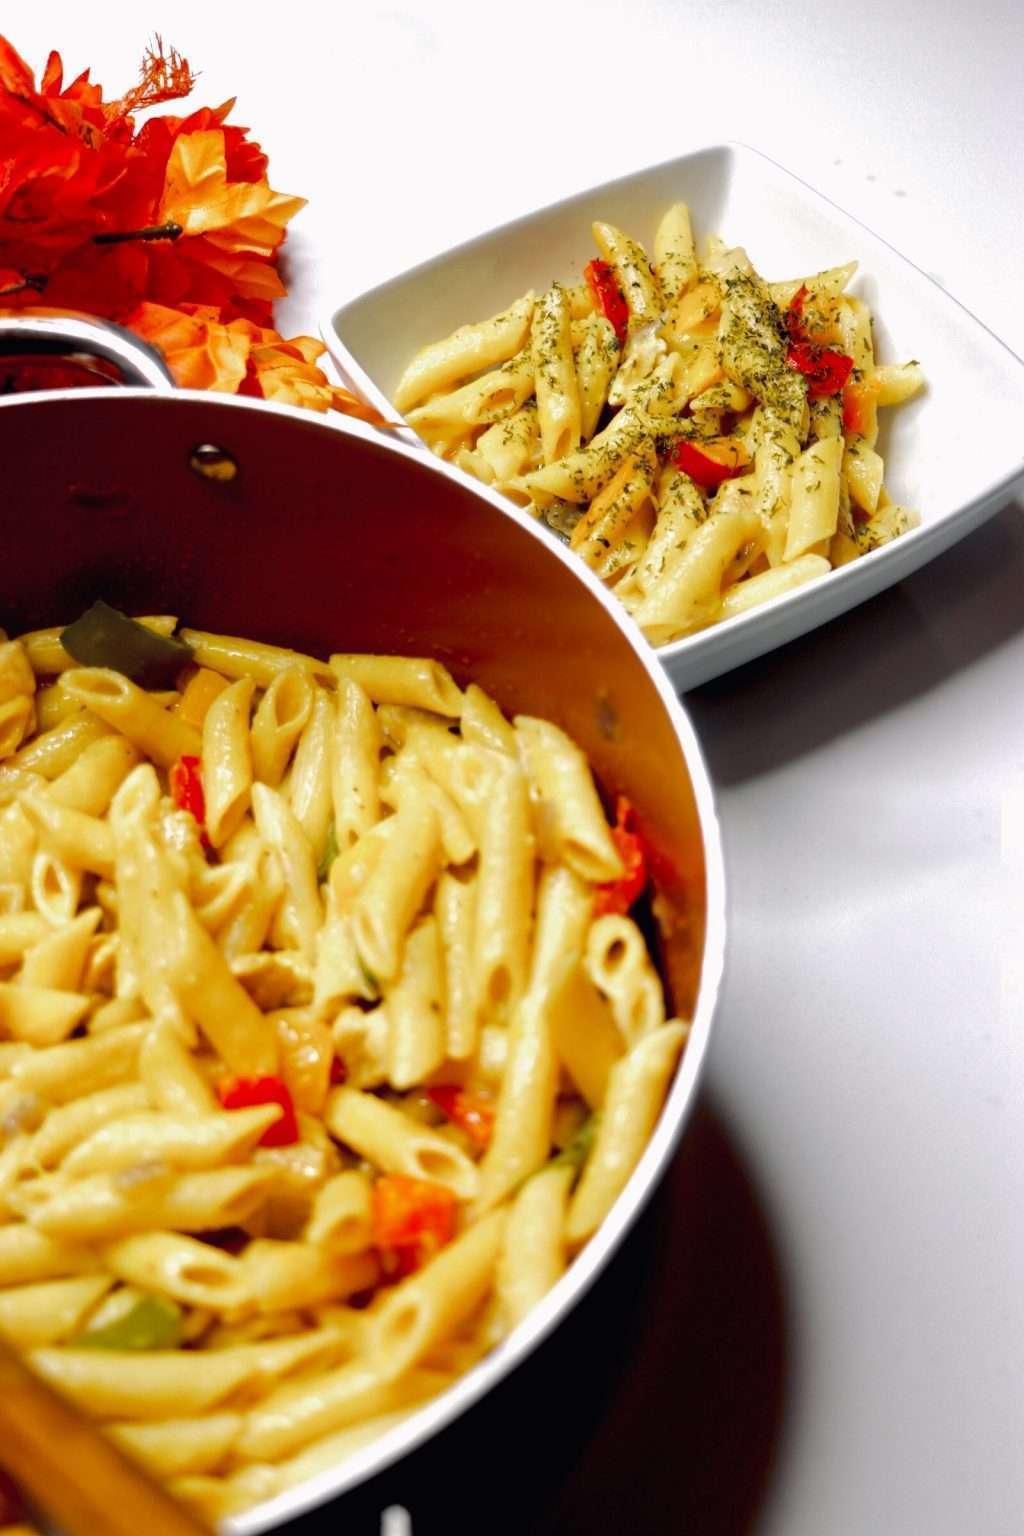 The best pasta chicken fajita recipe to eat 1024x1536 - The Best Chicken Fajita Pasta Recipe For The Holiday Season